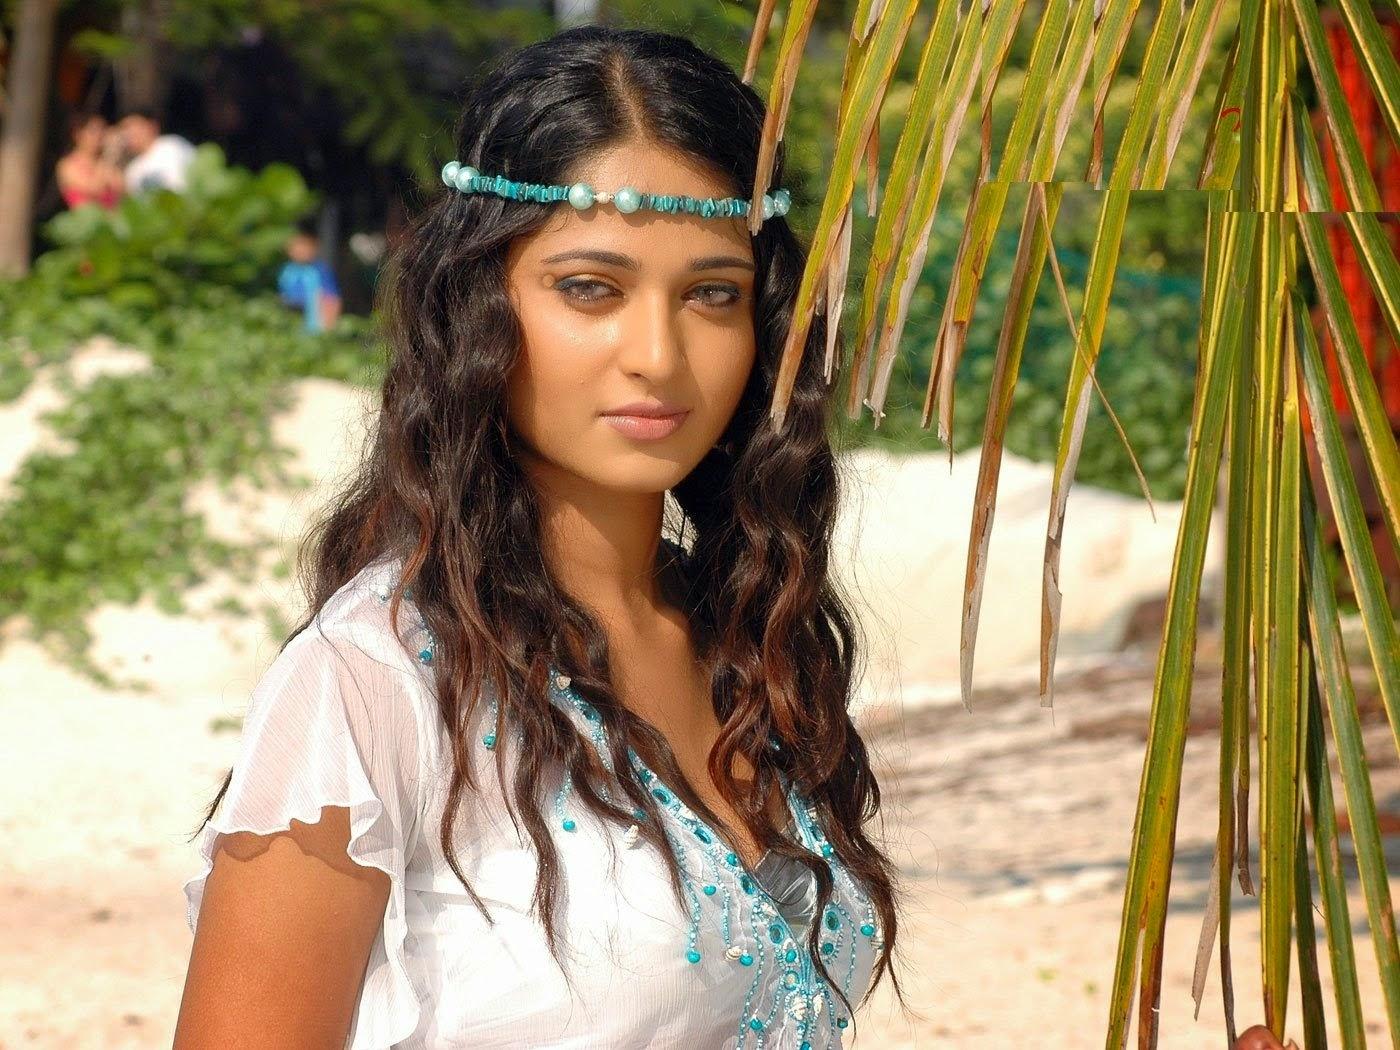 Anuska blue eye bollywood actress wallpaper